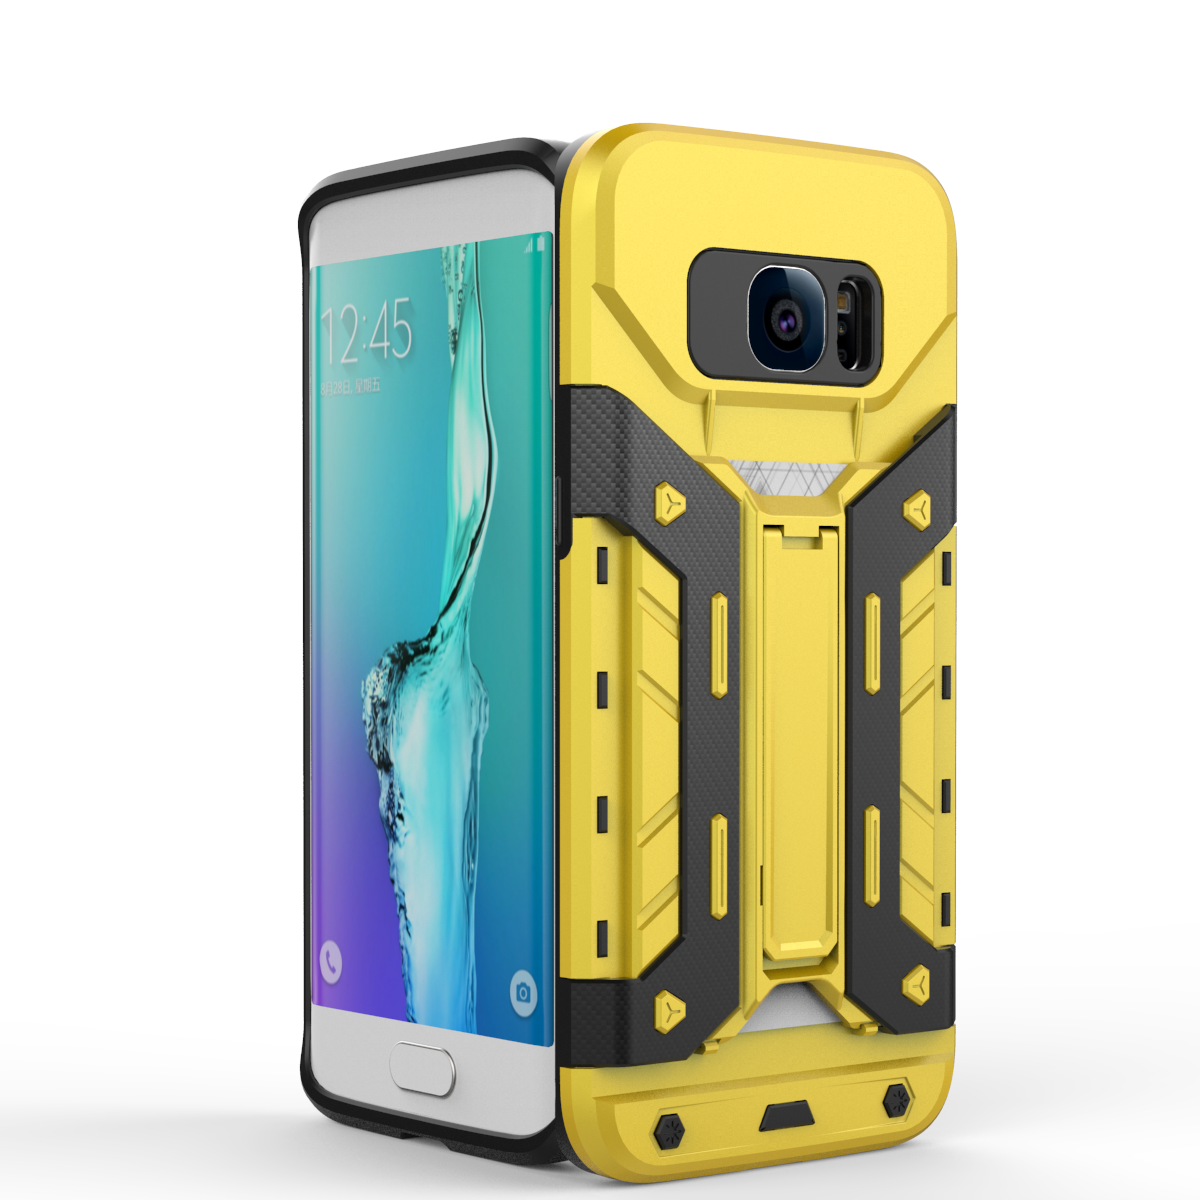 Galaxy S7 Edge Case Transformer Card Holder Yellow Samsung Galaxy S7 Edge Cases Samsung Galaxy S7 Edge Galaxy S7